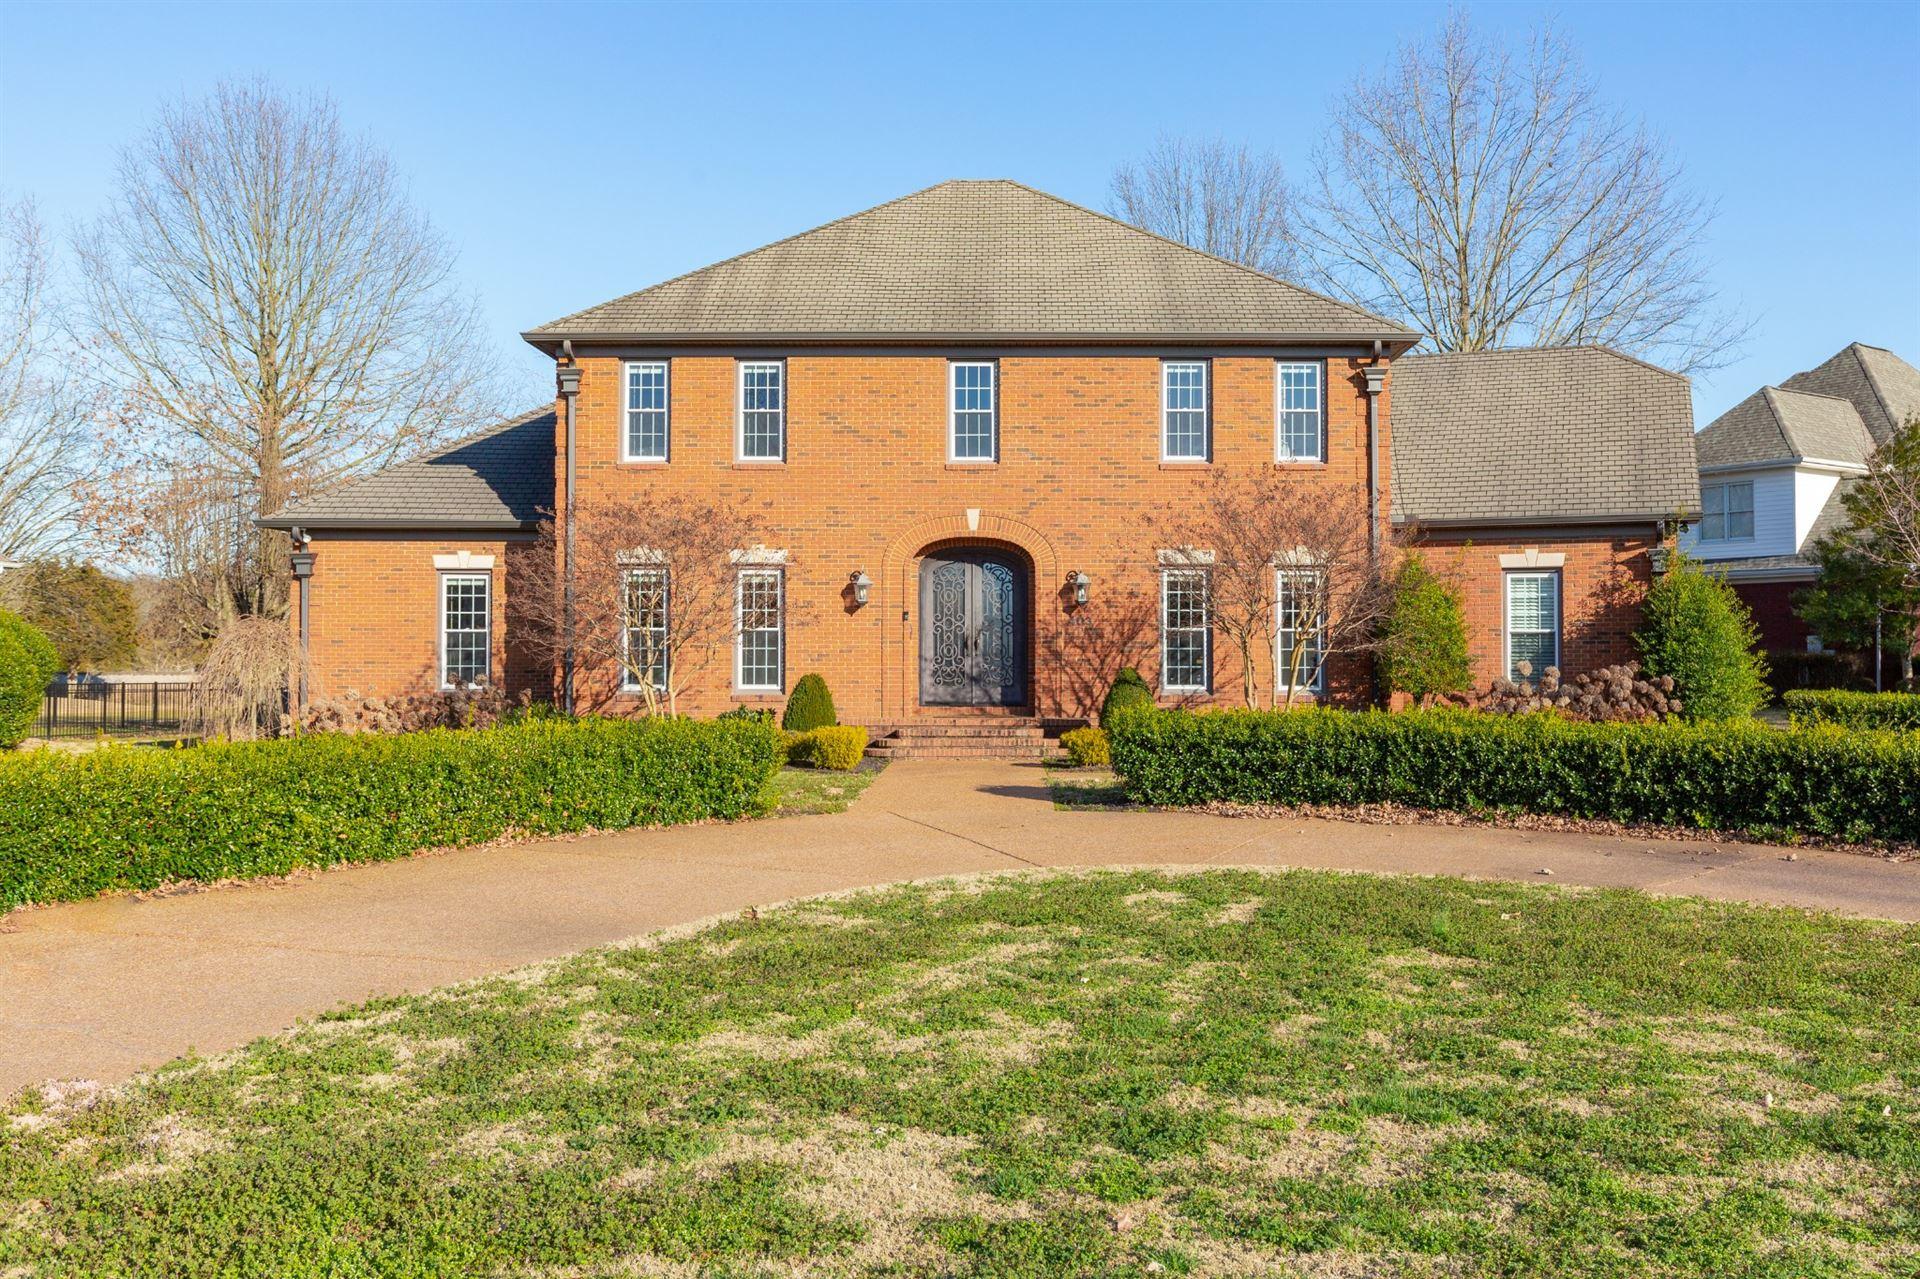 403 Council Bluff Pkwy, Murfreesboro, TN 37127 - MLS#: 2233643